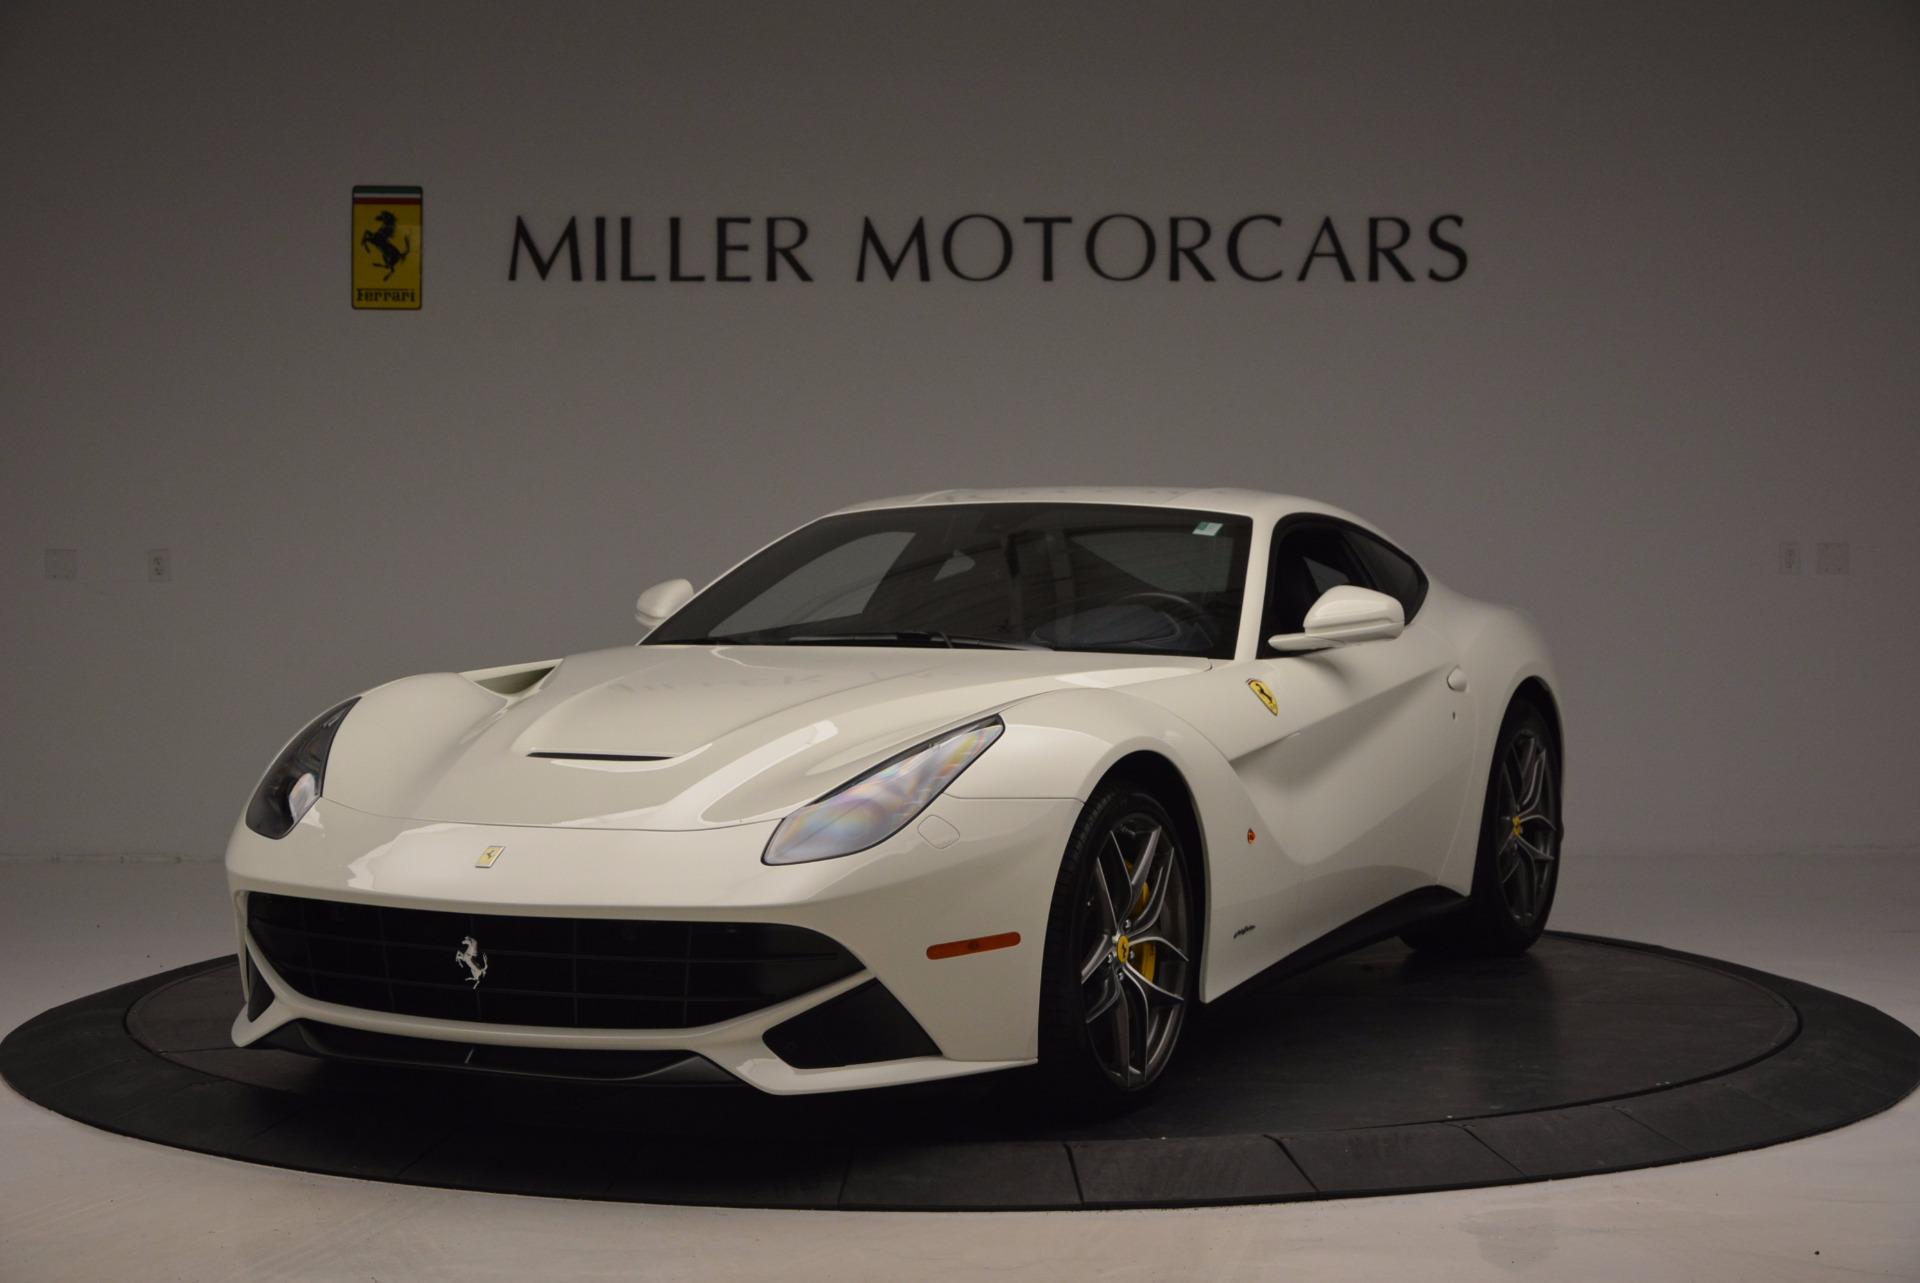 Used 2017 Ferrari F12 Berlinetta for sale Sold at Rolls-Royce Motor Cars Greenwich in Greenwich CT 06830 1